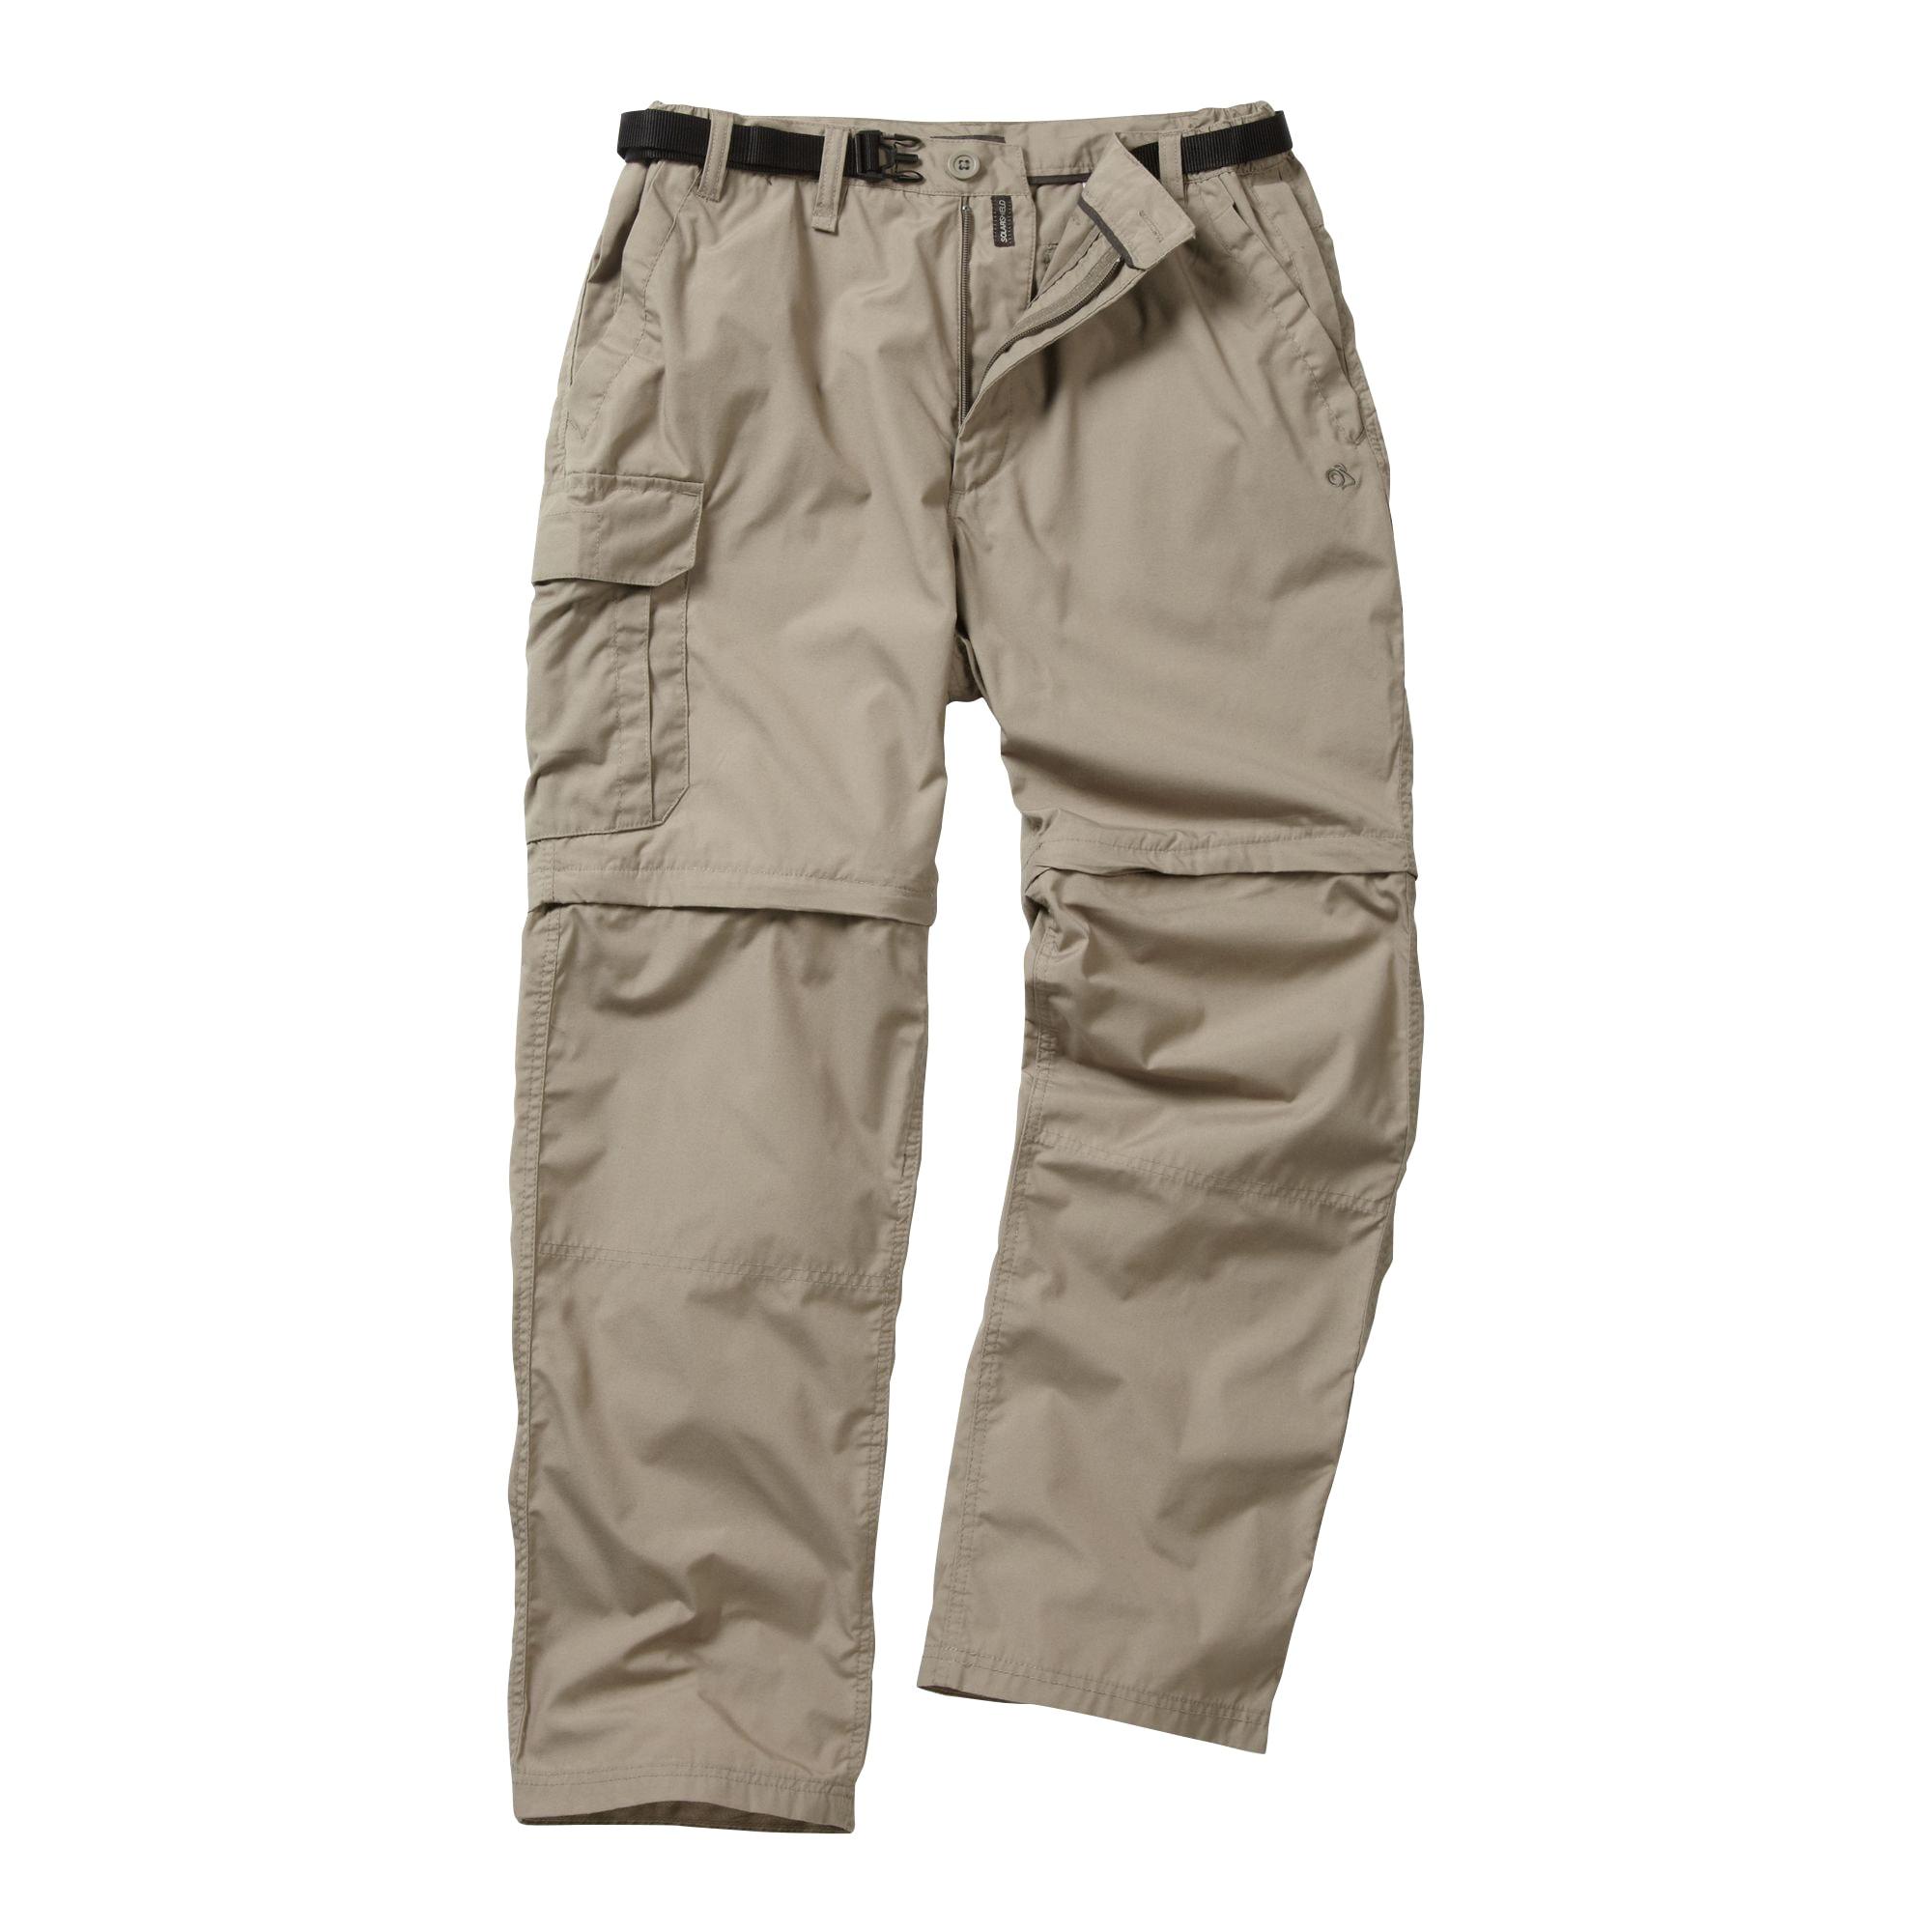 Craghoppers Zip-off-Hose Kiwi Klassische Herren Hose | Bekleidung > Hosen > Sonstige Hosen | Grau | Craghoppers